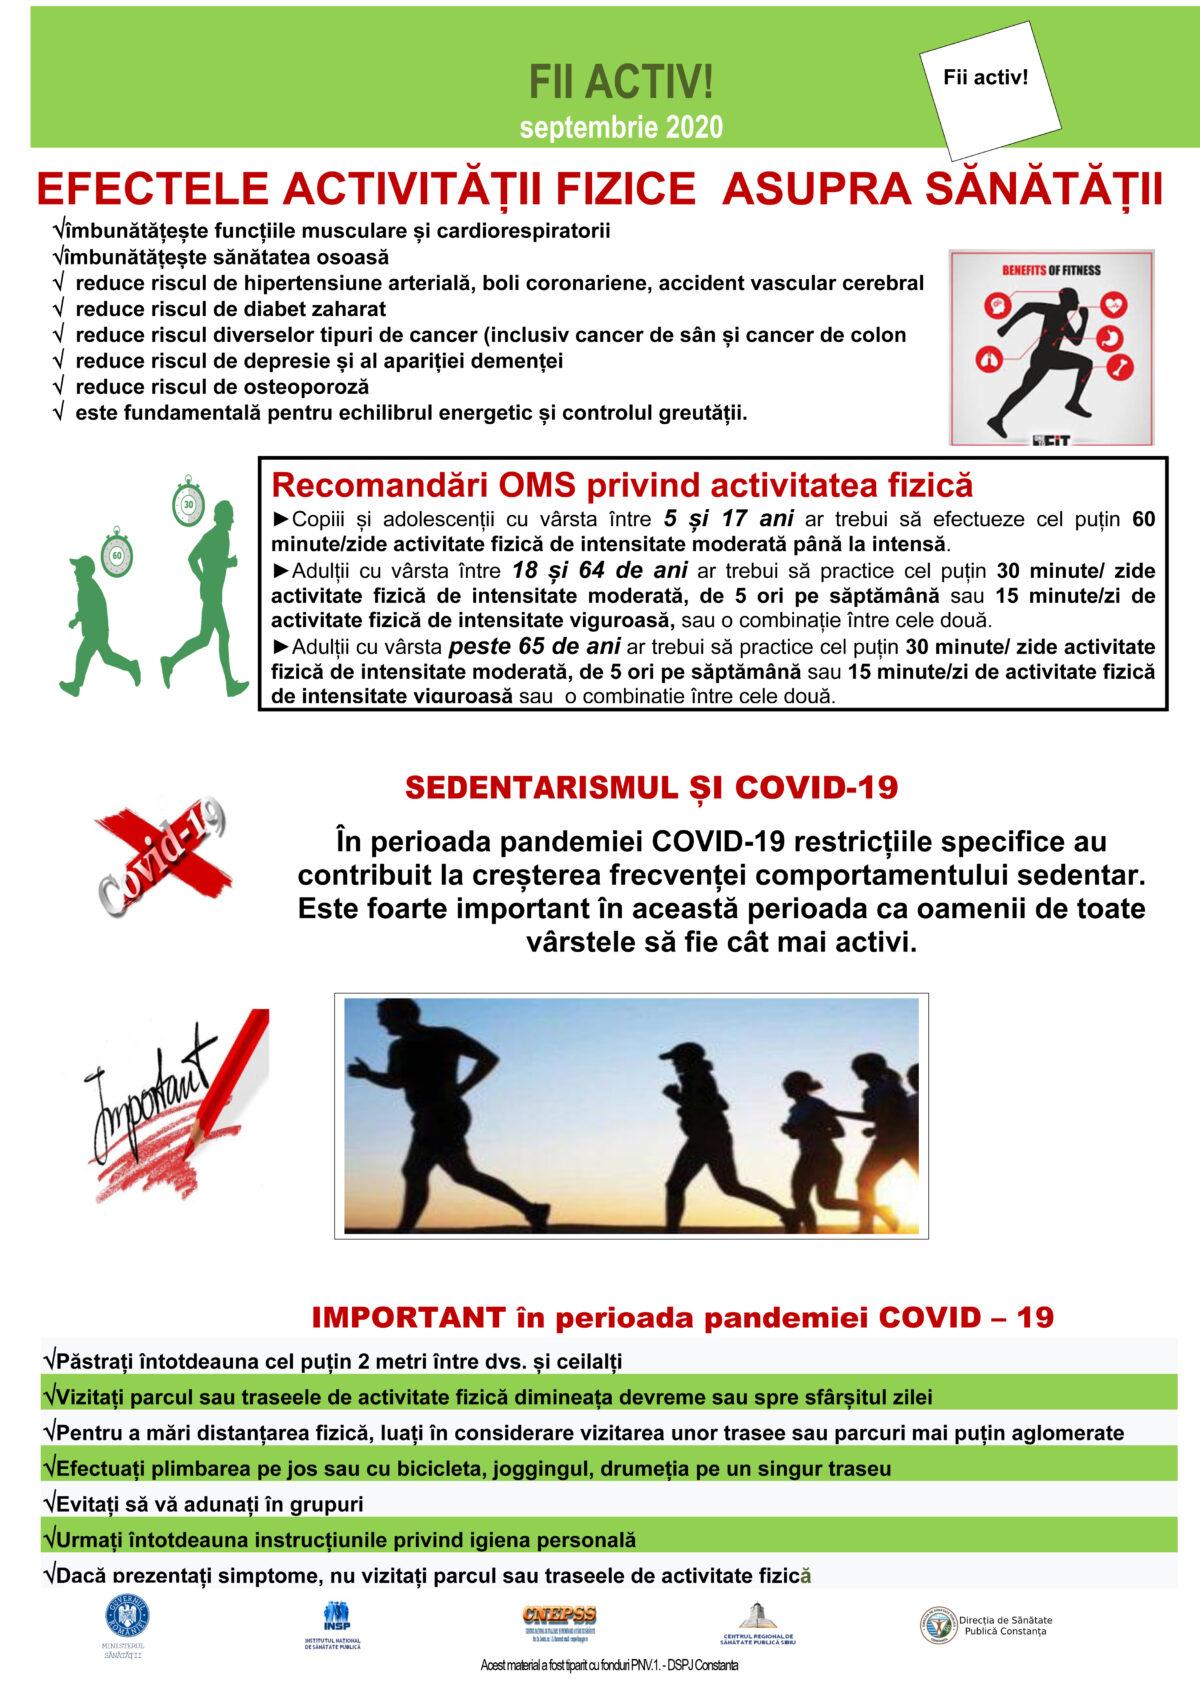 Efectele-activitatii-fizice-asupra-sanatatii-1200x1687.jpg